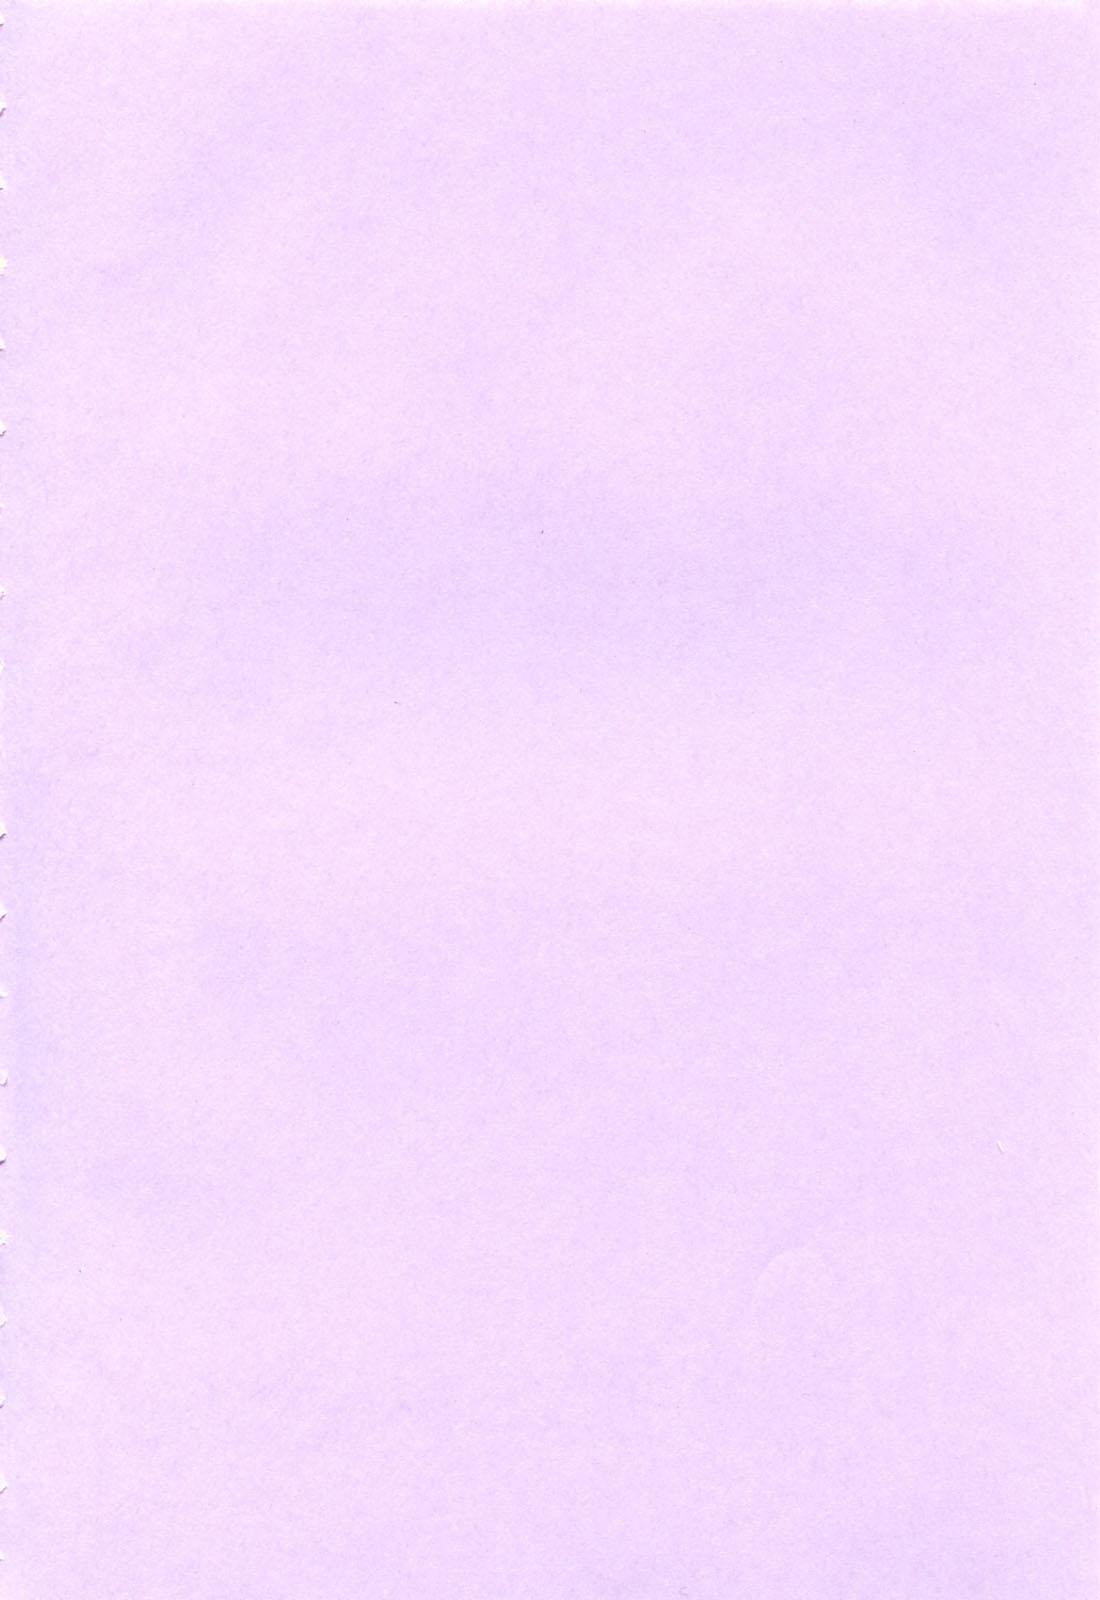 Kanjuku Hitozuma Nikki - The diary of the mature married woman 195